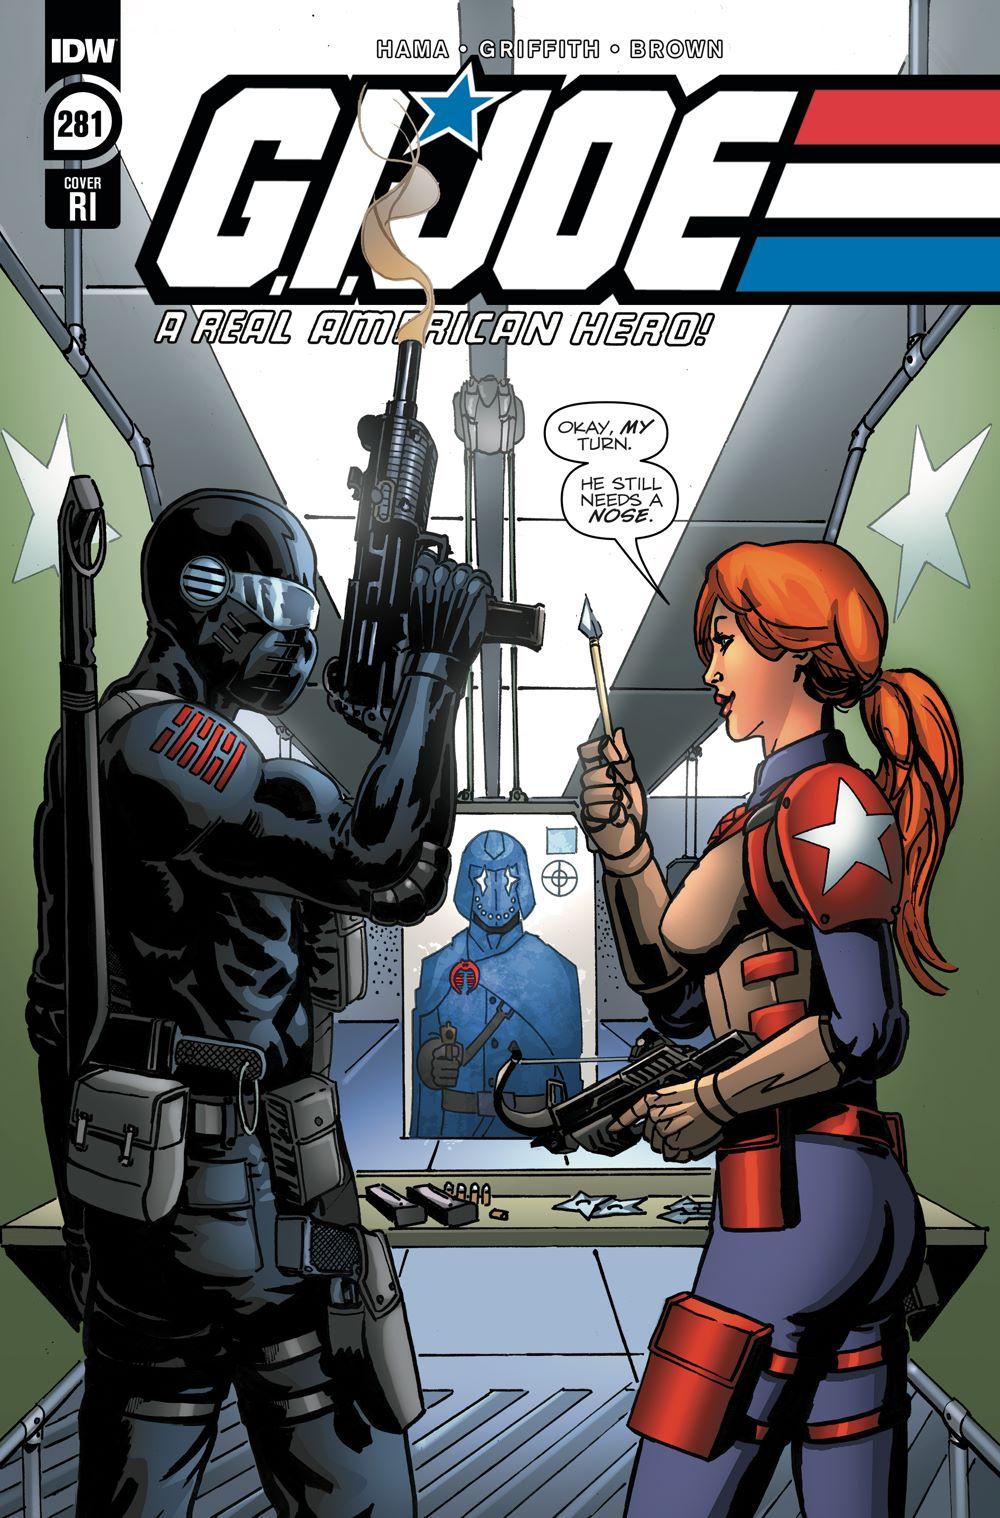 GIJoeRAH281-coverRI ComicList Previews: G.I. JOE A REAL AMERICAN HERO #281